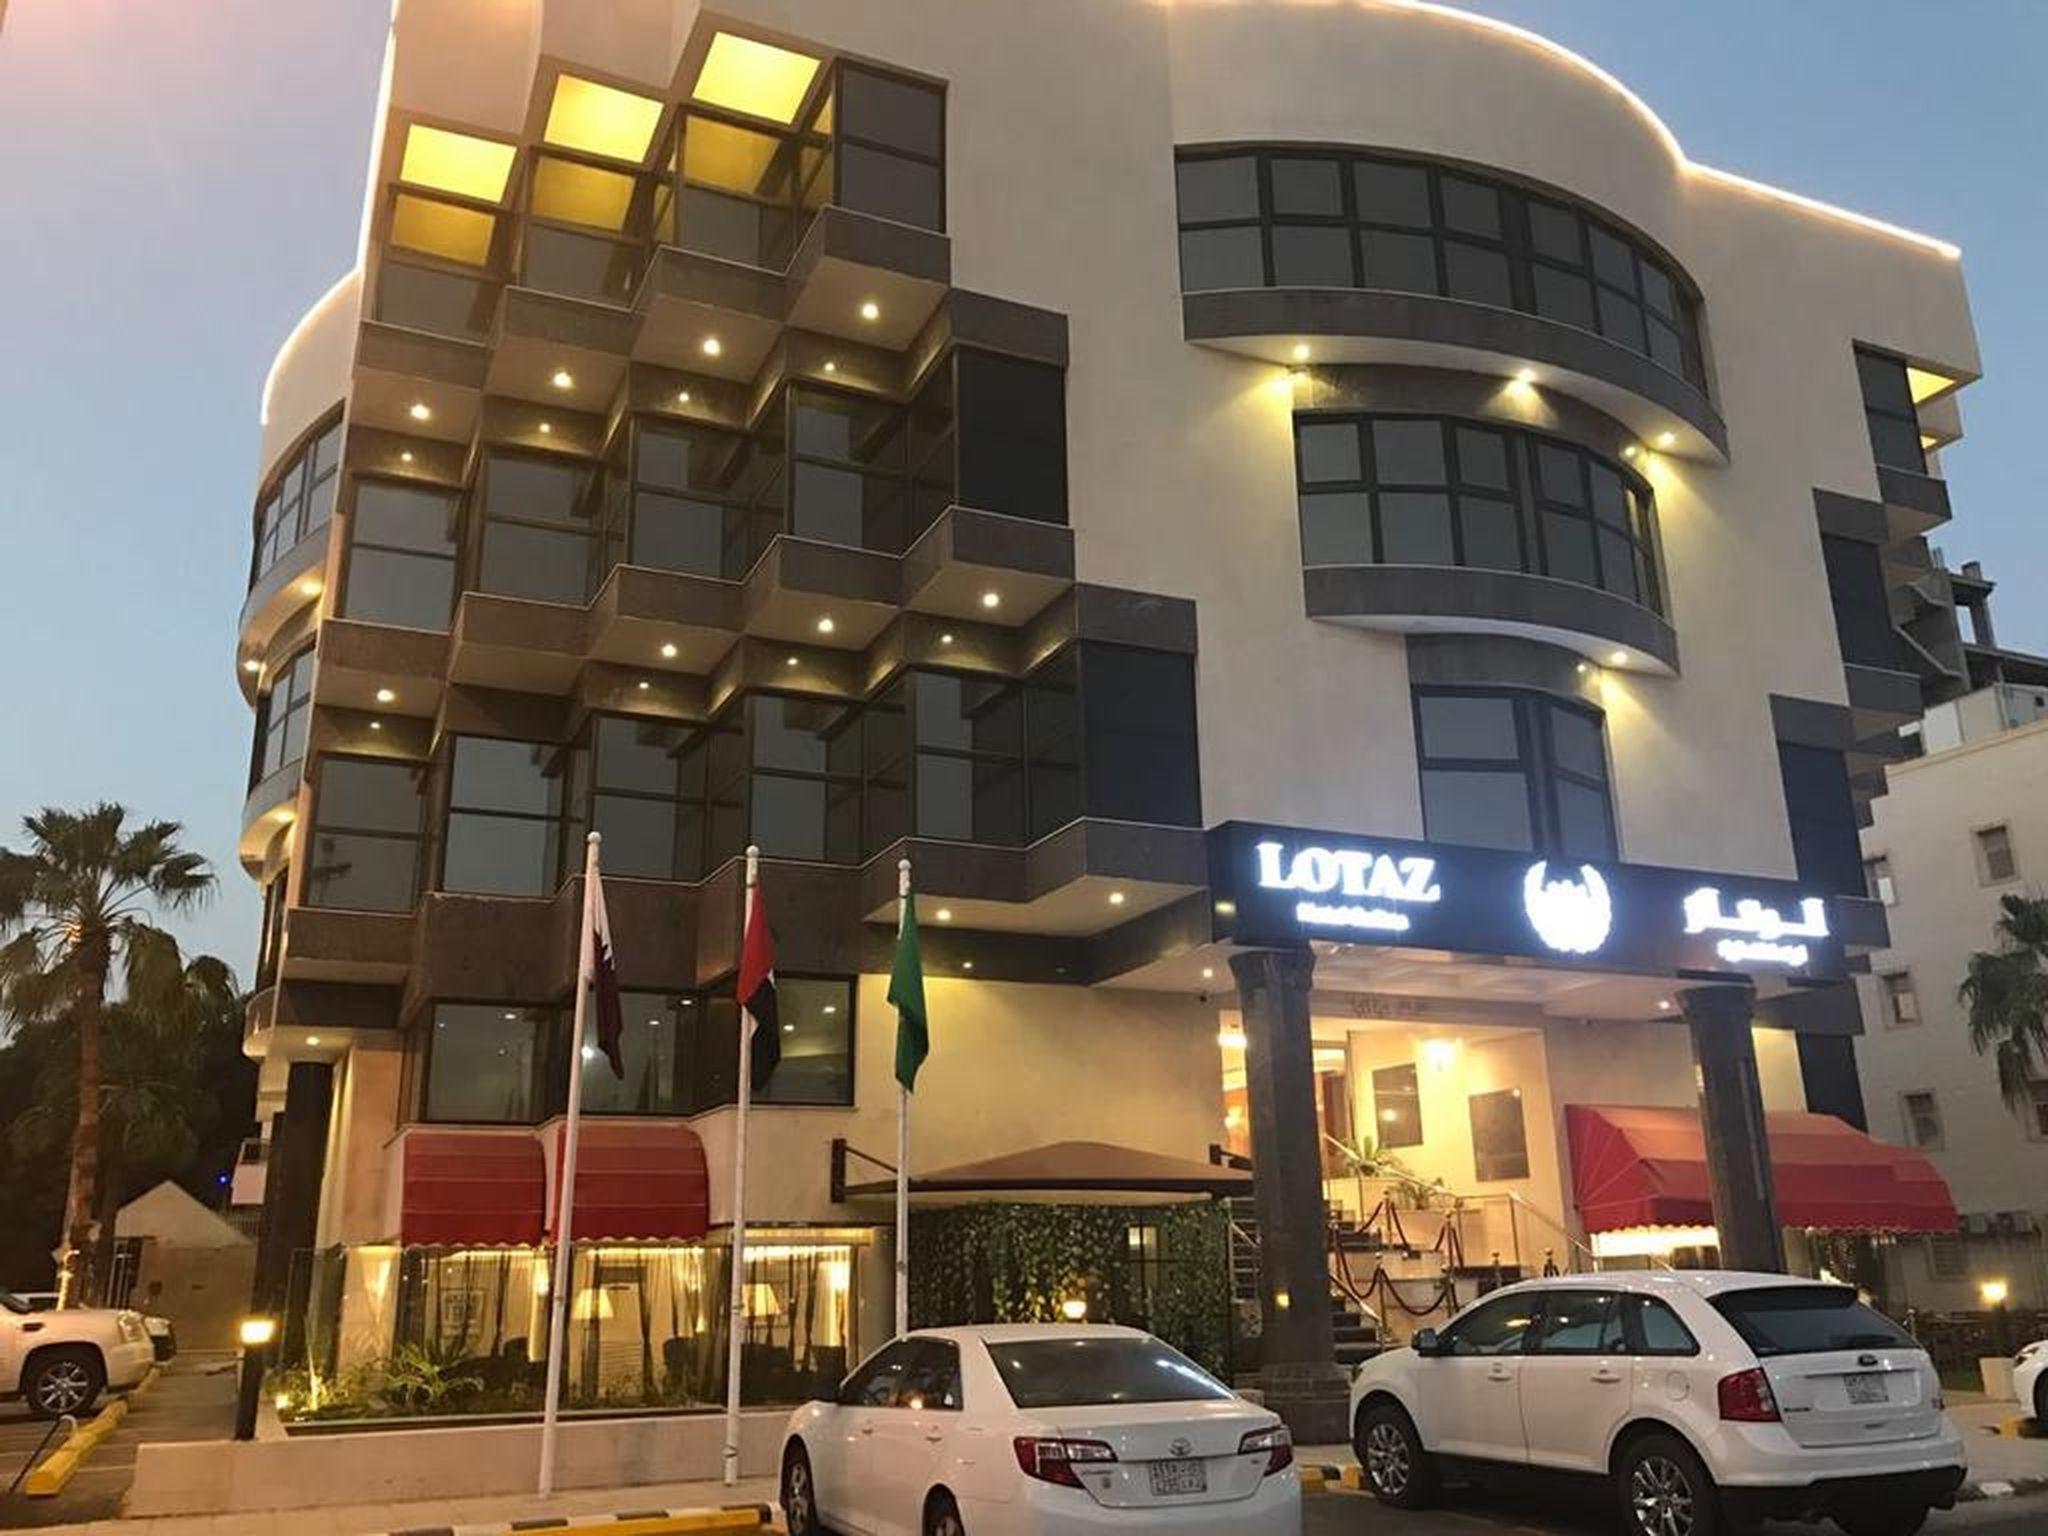 Lotaz Hotel Suites